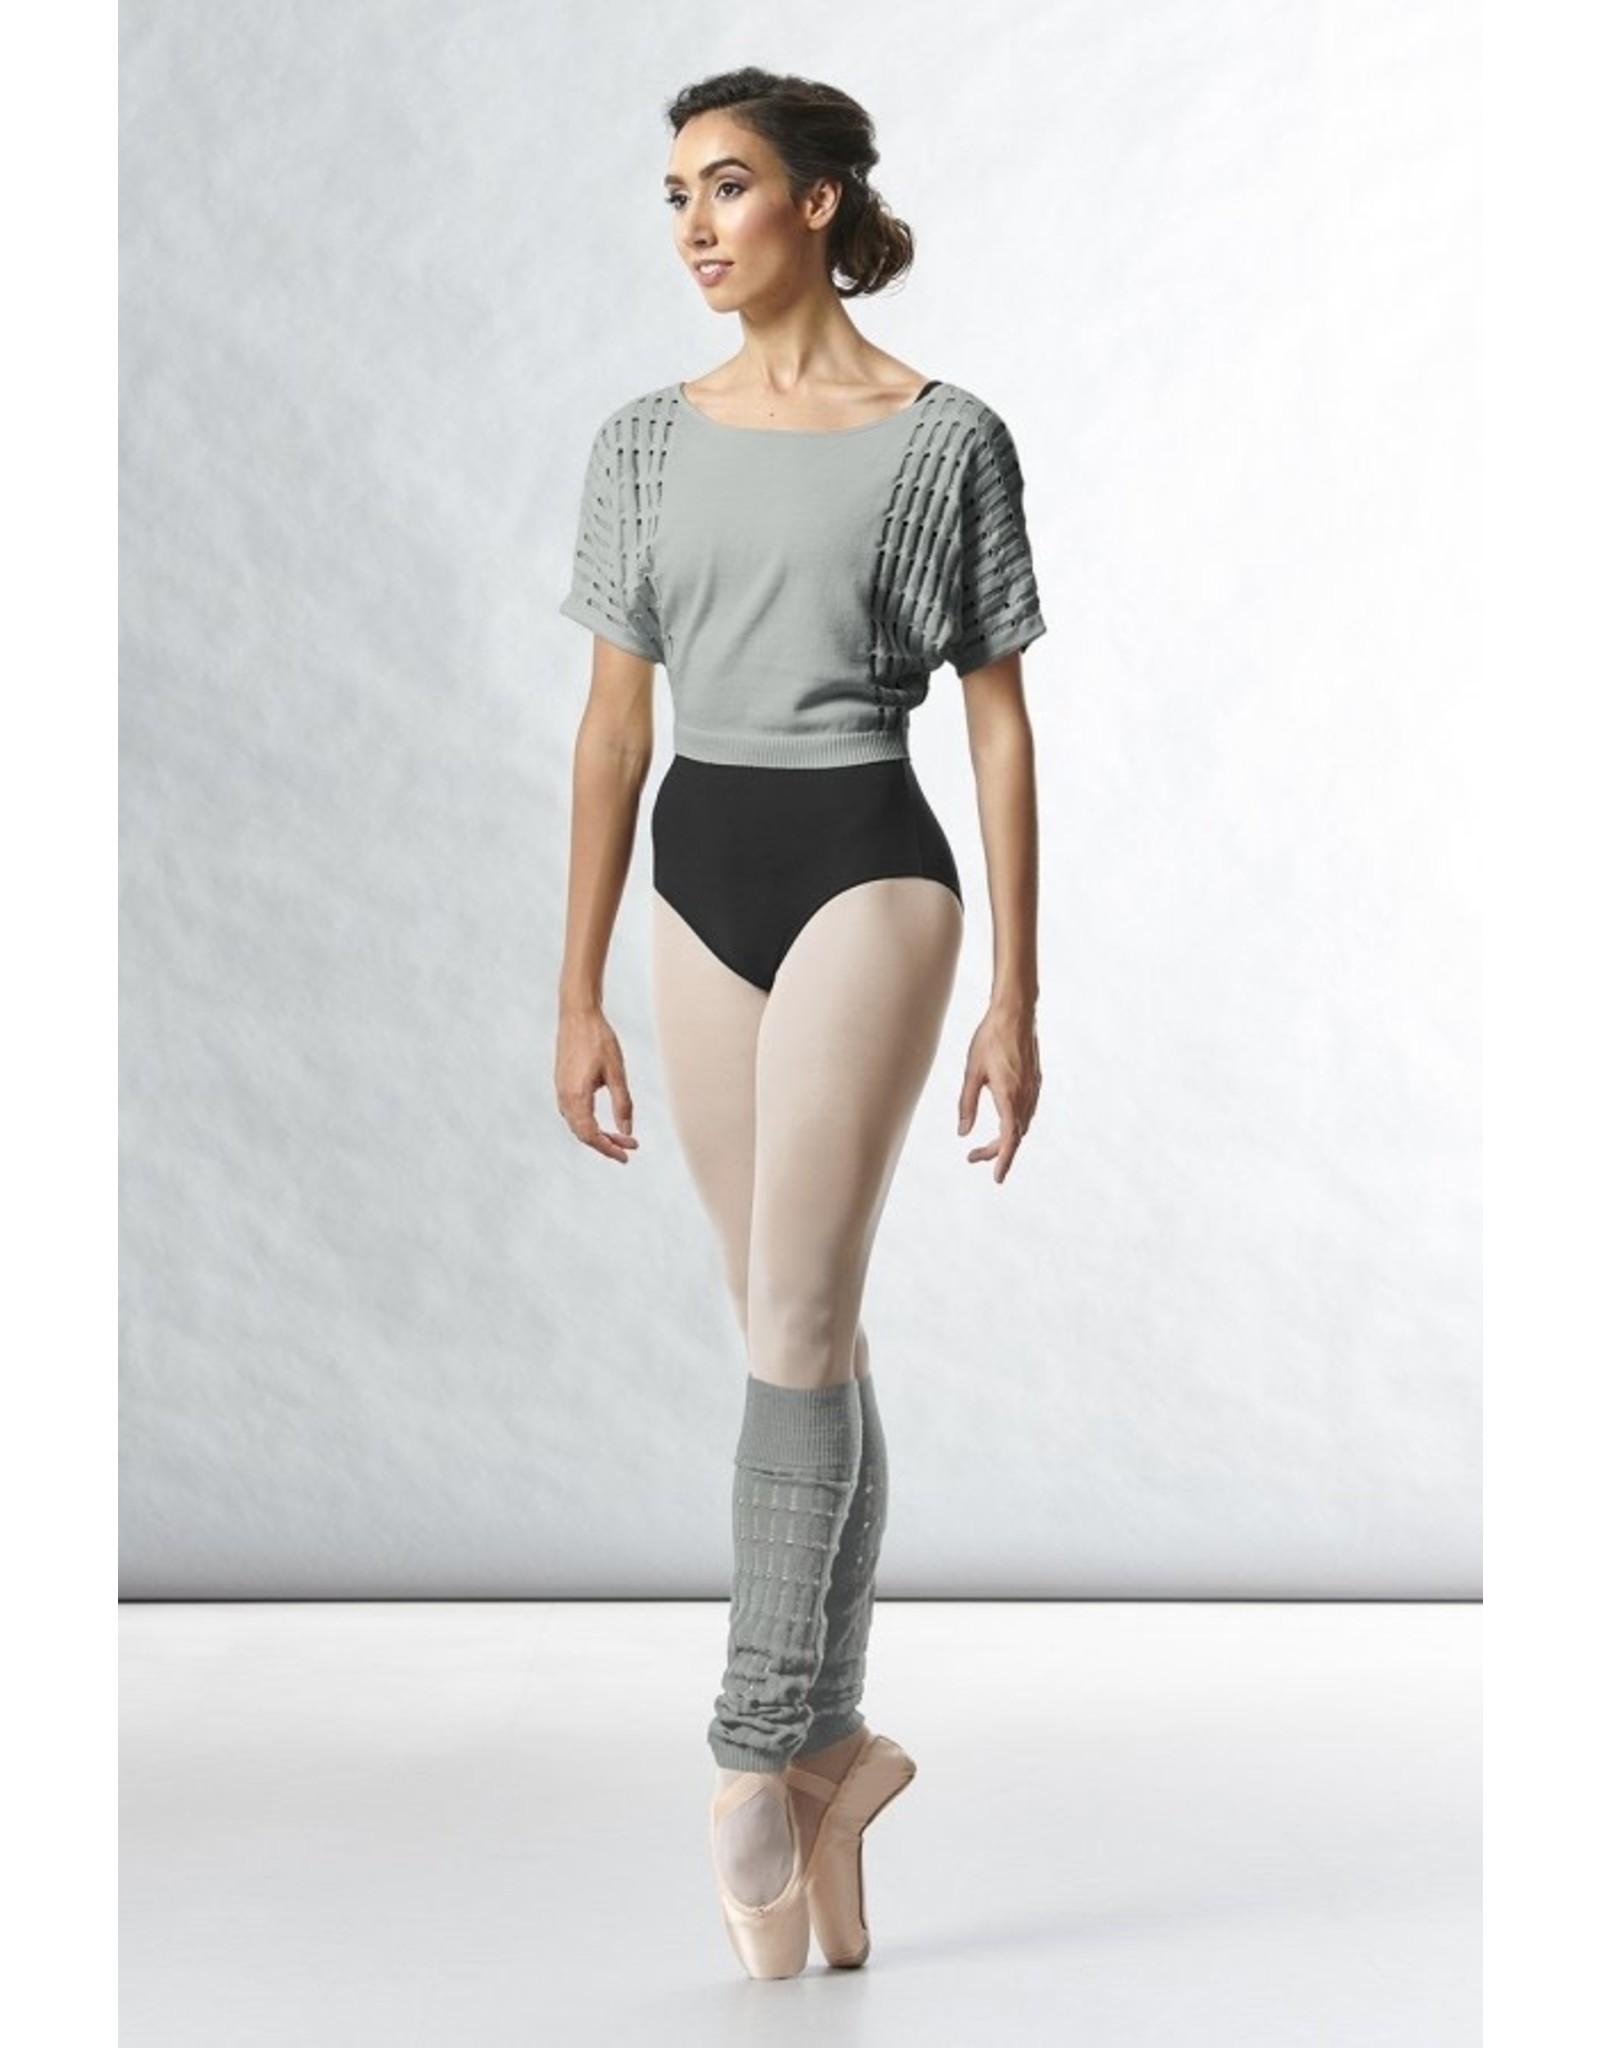 Bloch / Mirella Knitted Leg Warmers (W5520)